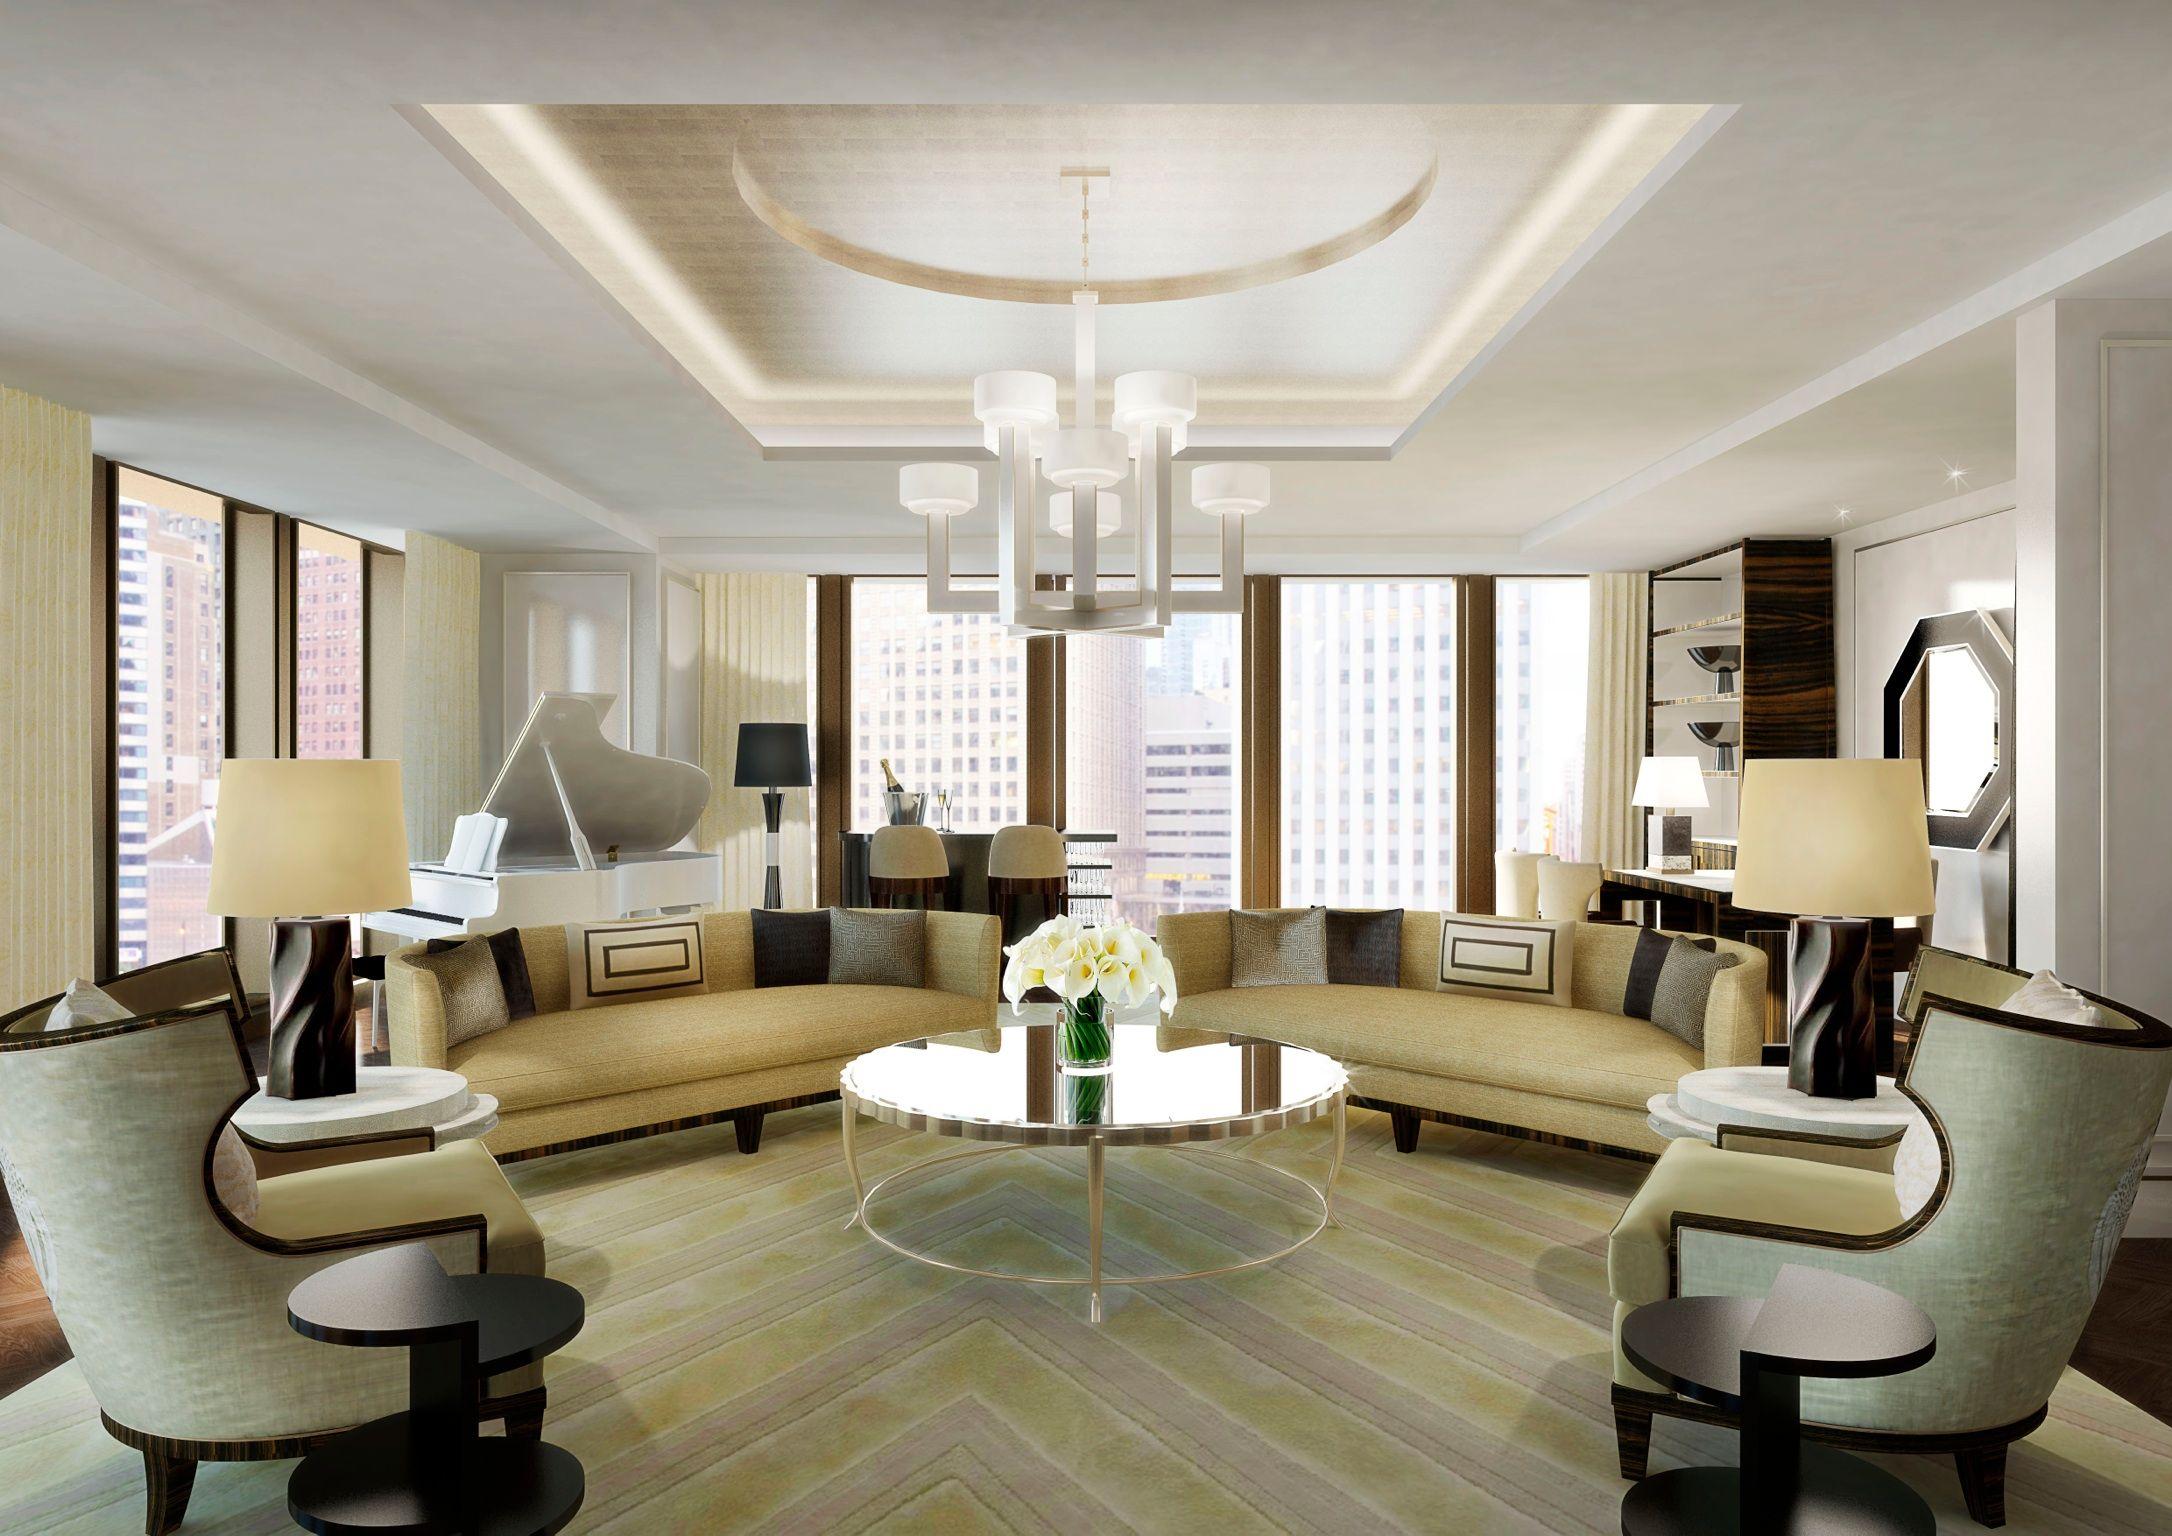 Hotel Chicago Suites The Langham Chicago Hotel Room Interior Living Room Modern Opulent Interiors